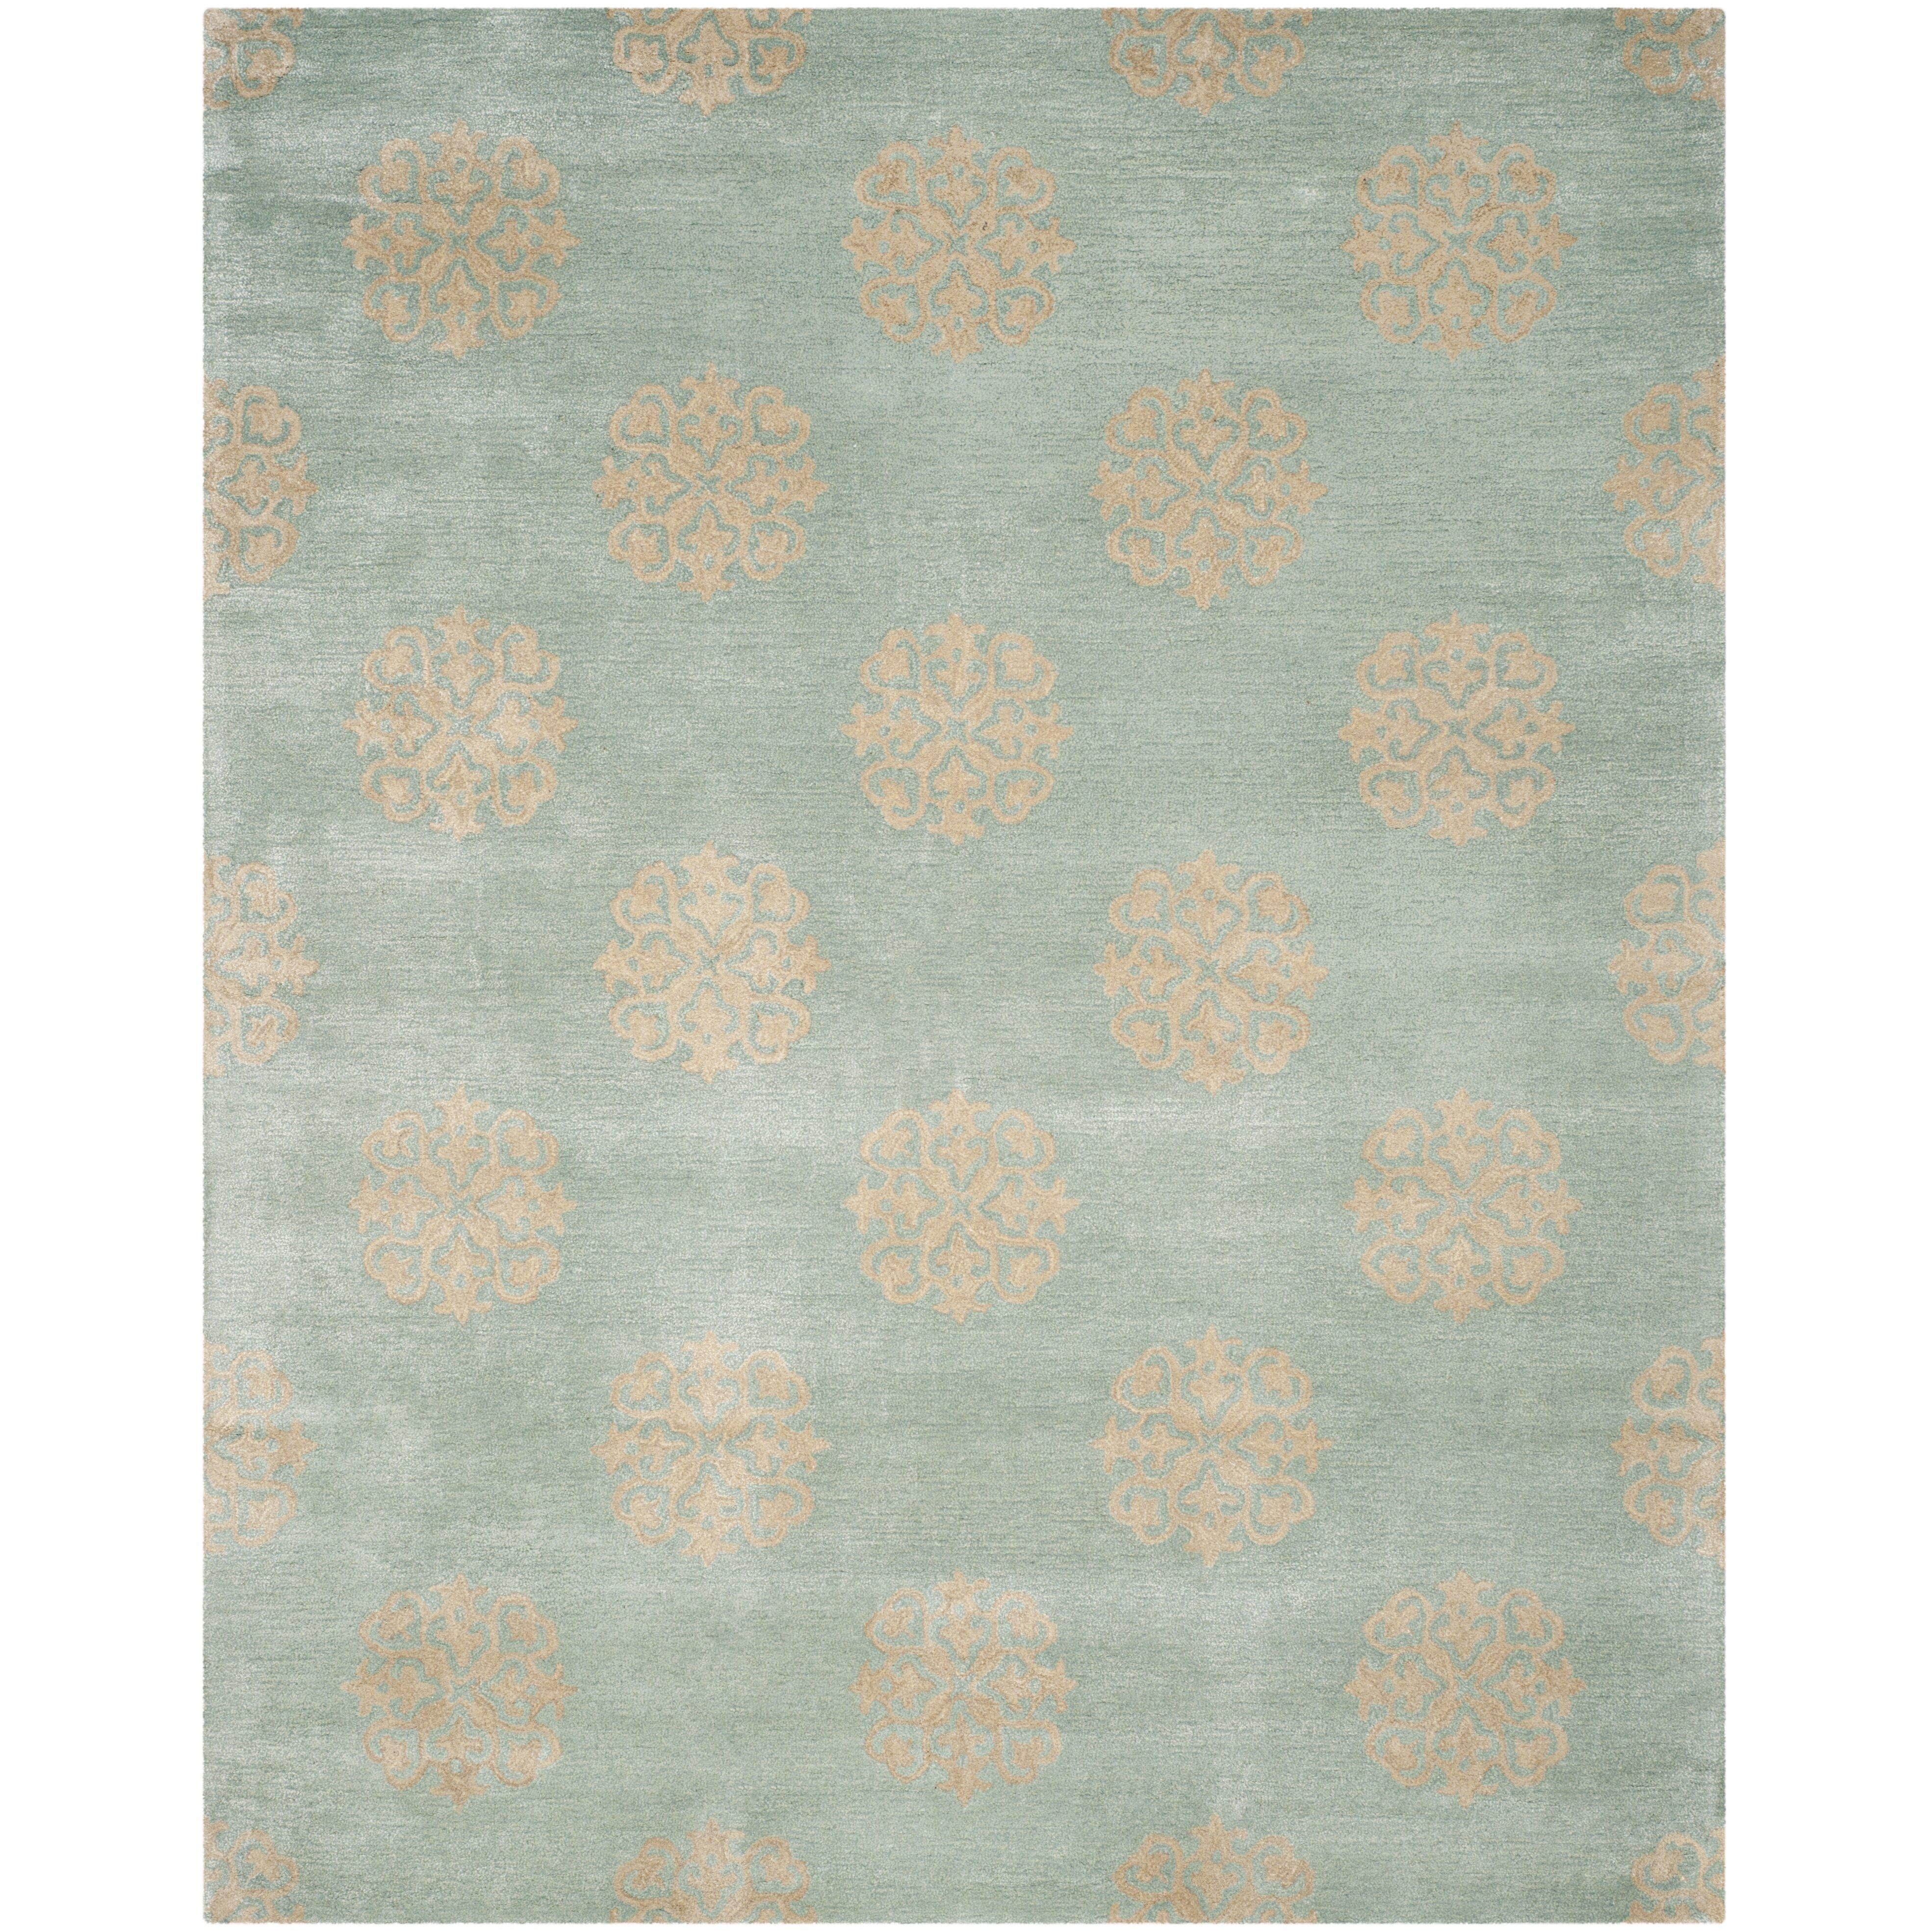 Safavieh Soho HandTufted Blue Area Rug & Reviews  Wayfair UK